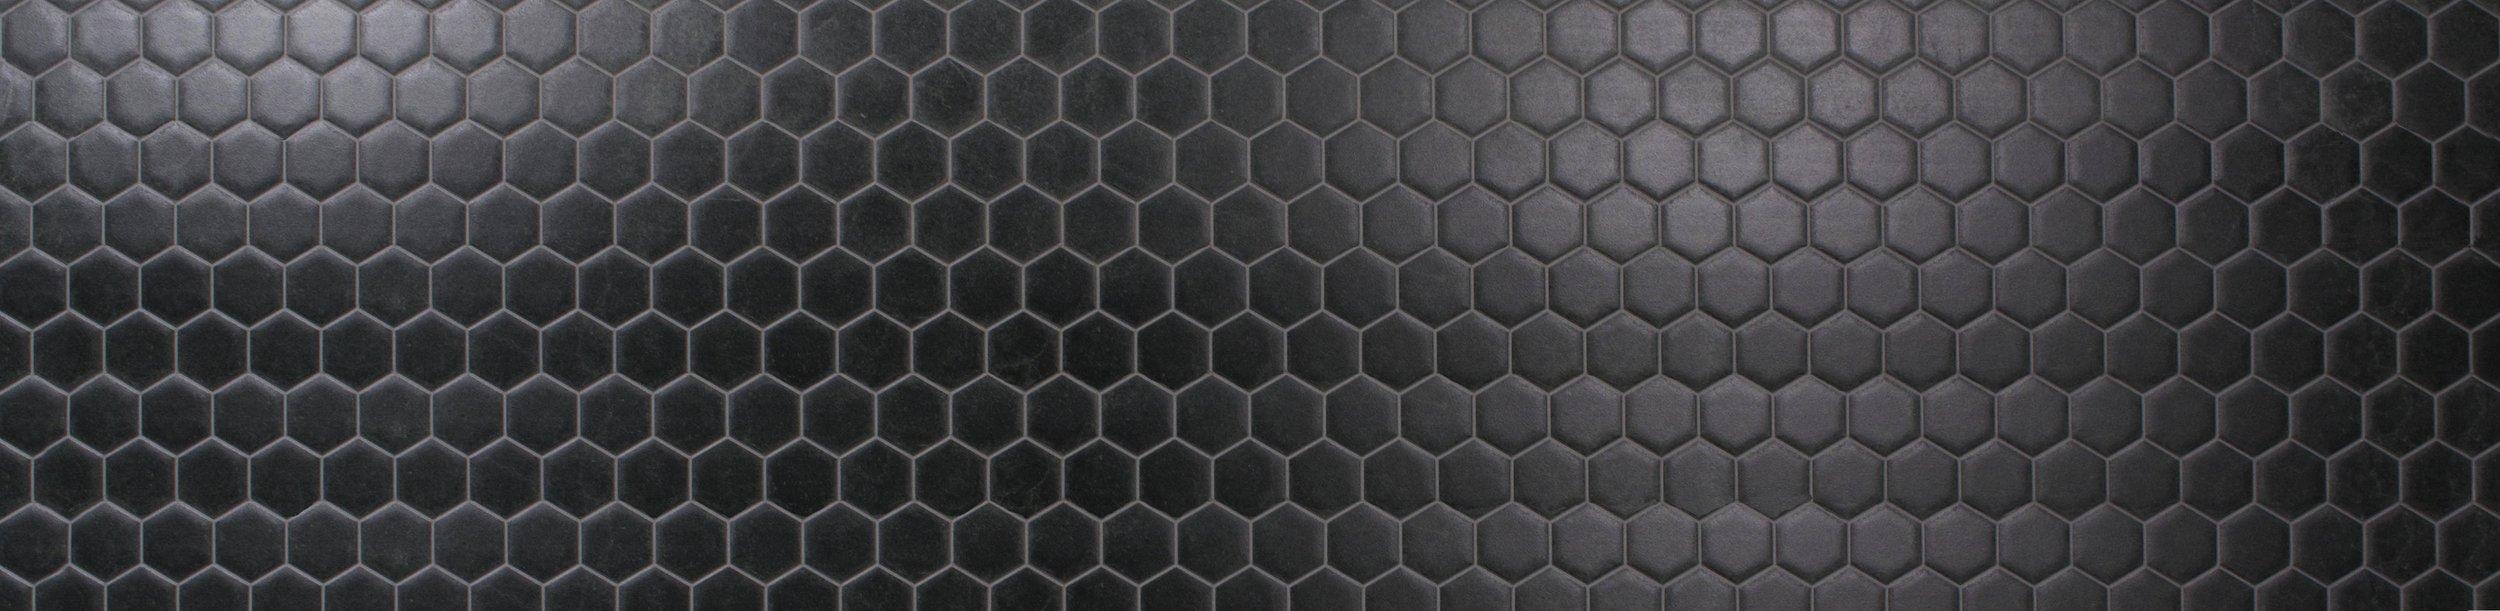 Honeycomb tile blk walltex.jpg